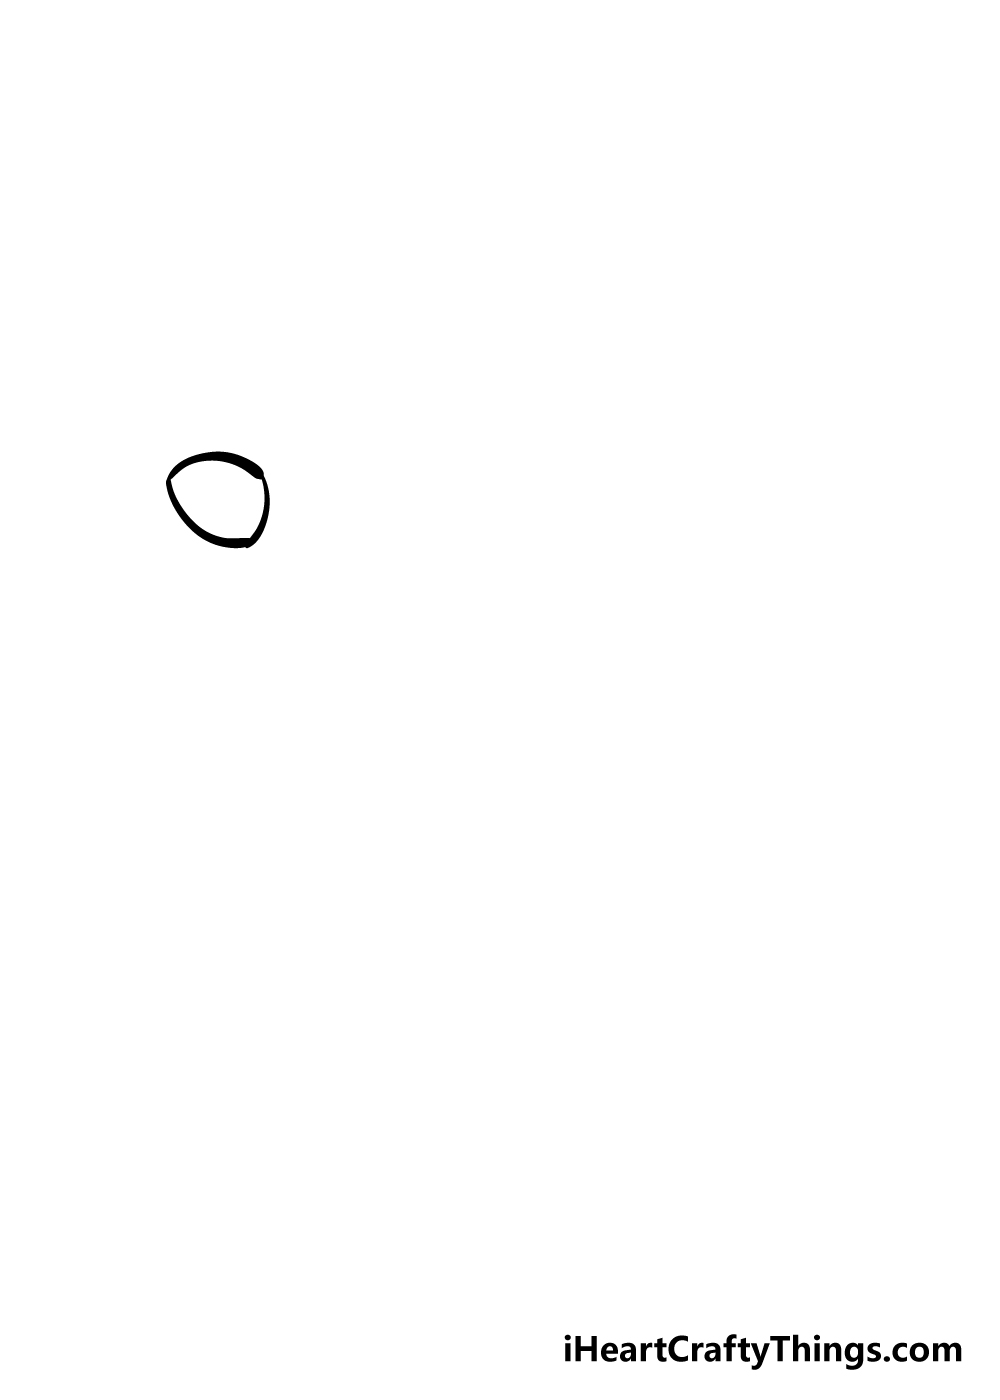 drawing chicken step 1